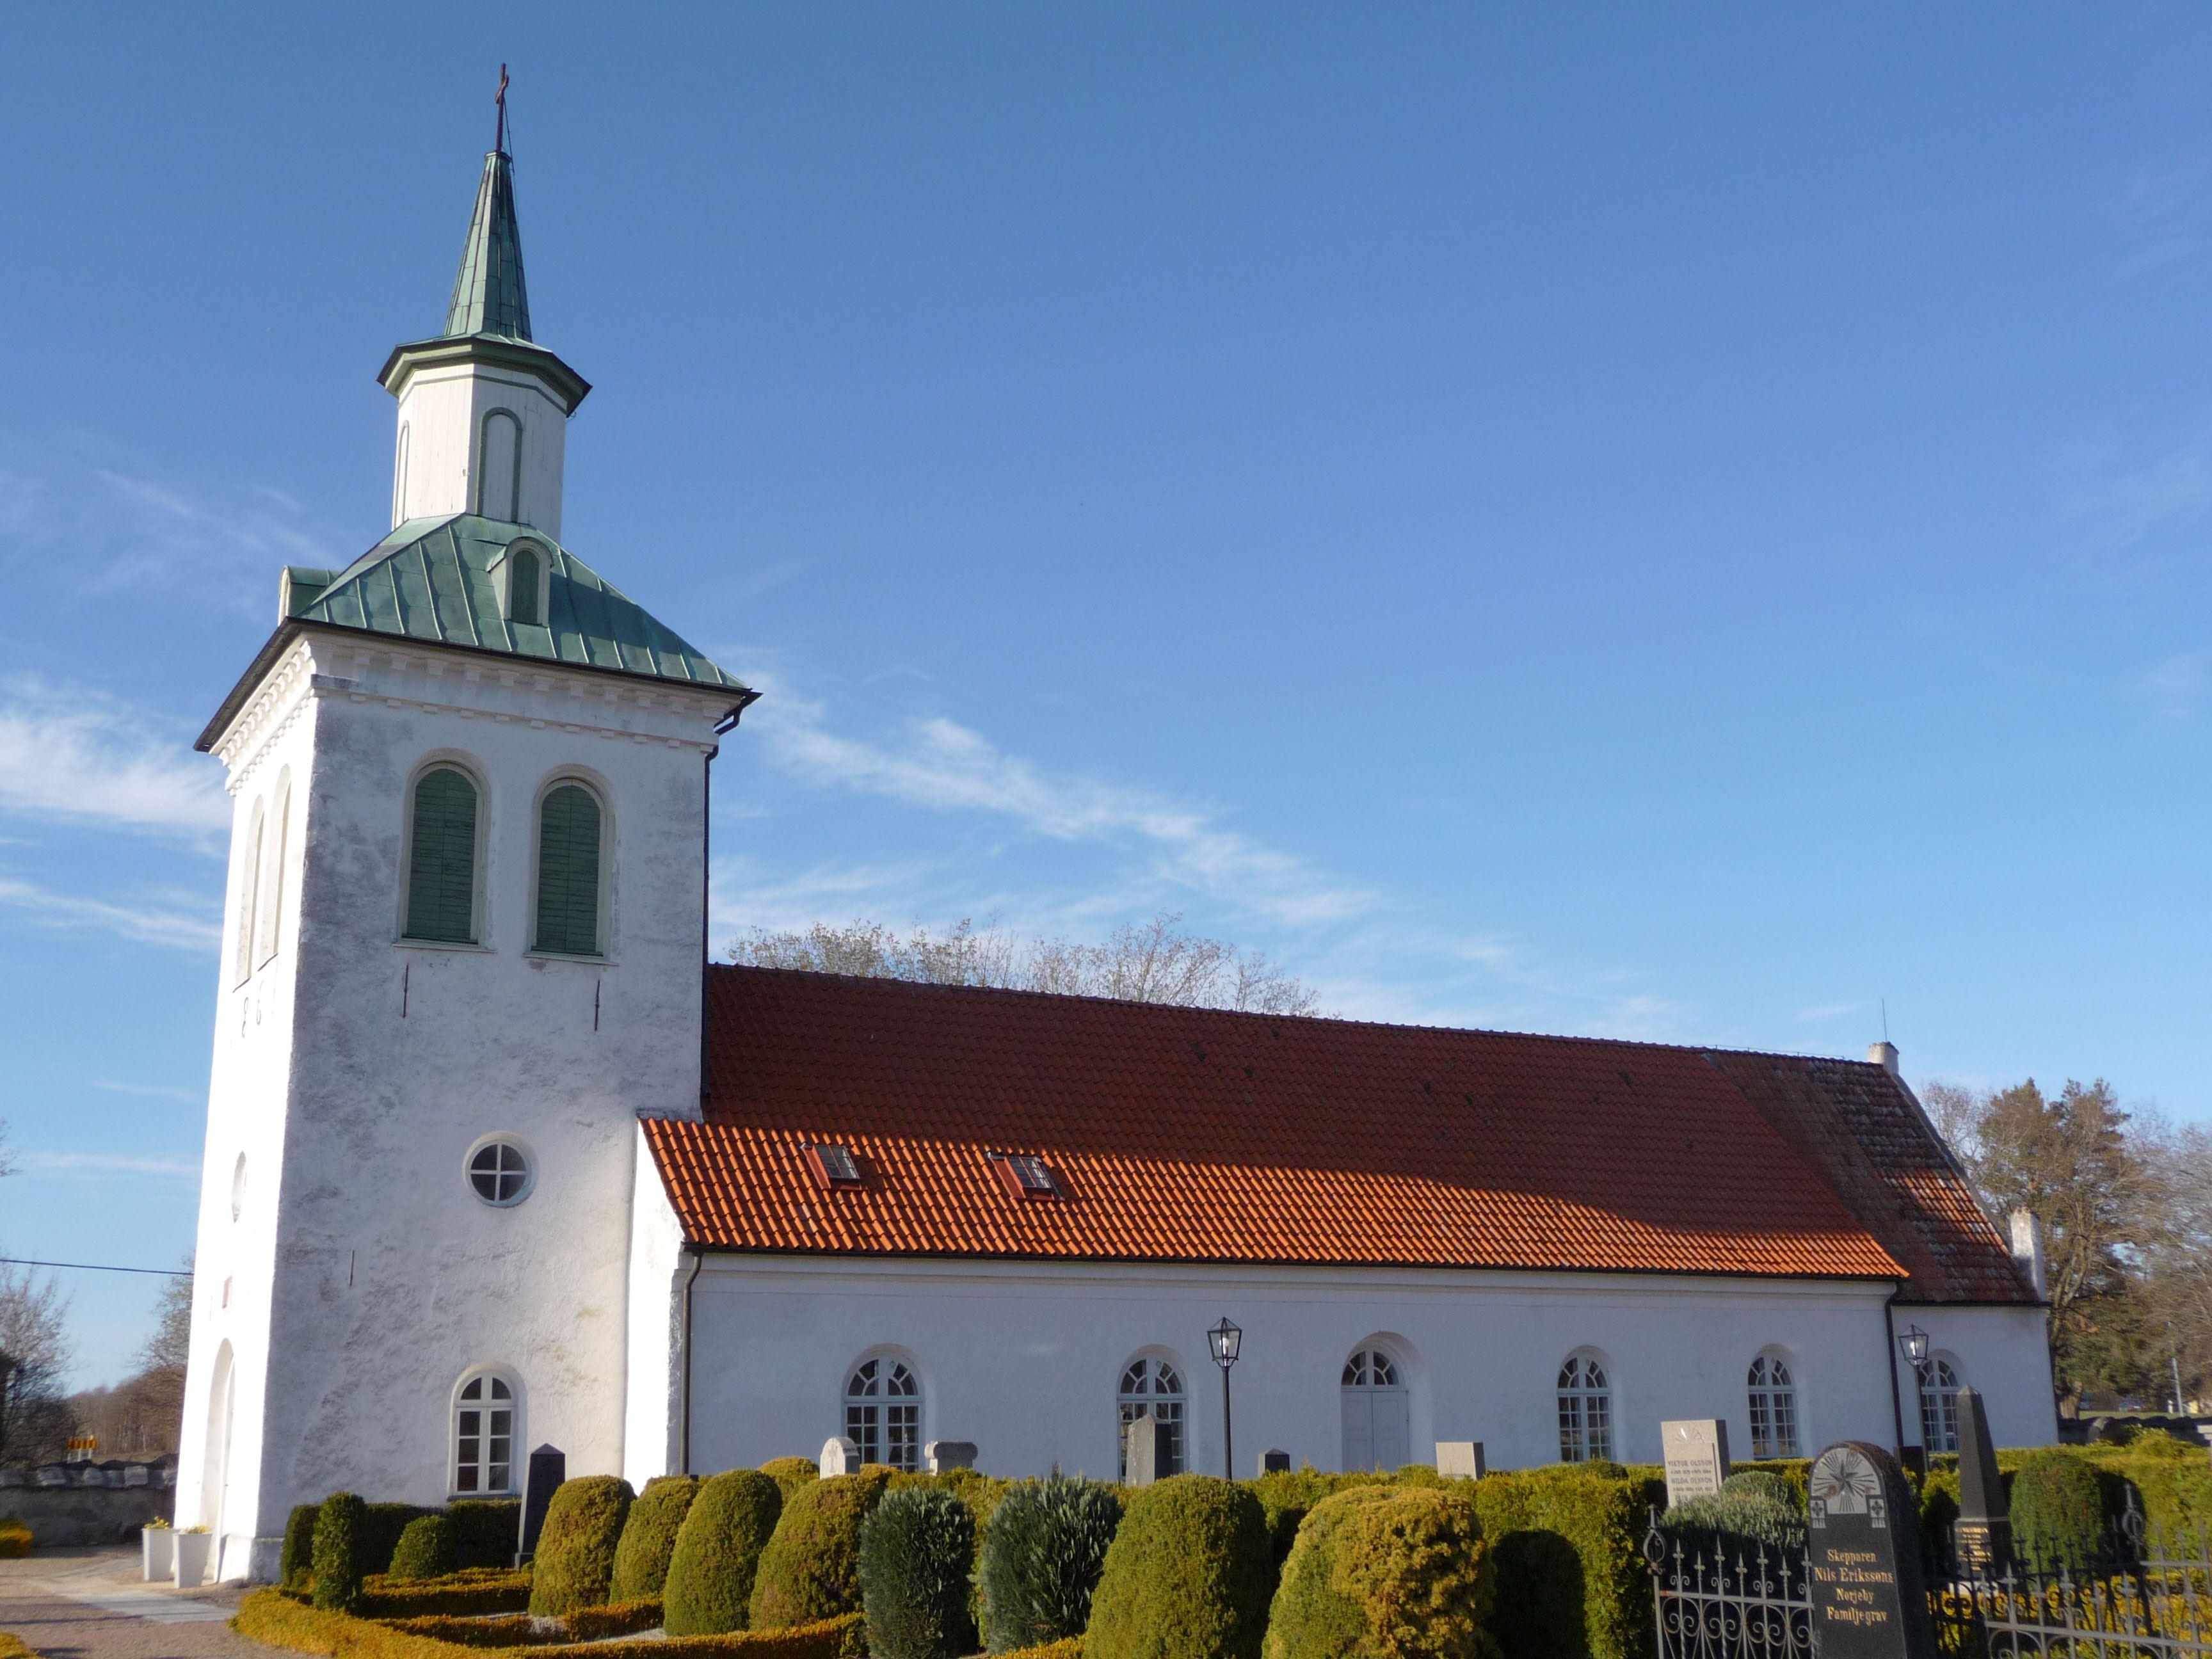 Anette Olofsson, Väkyrka